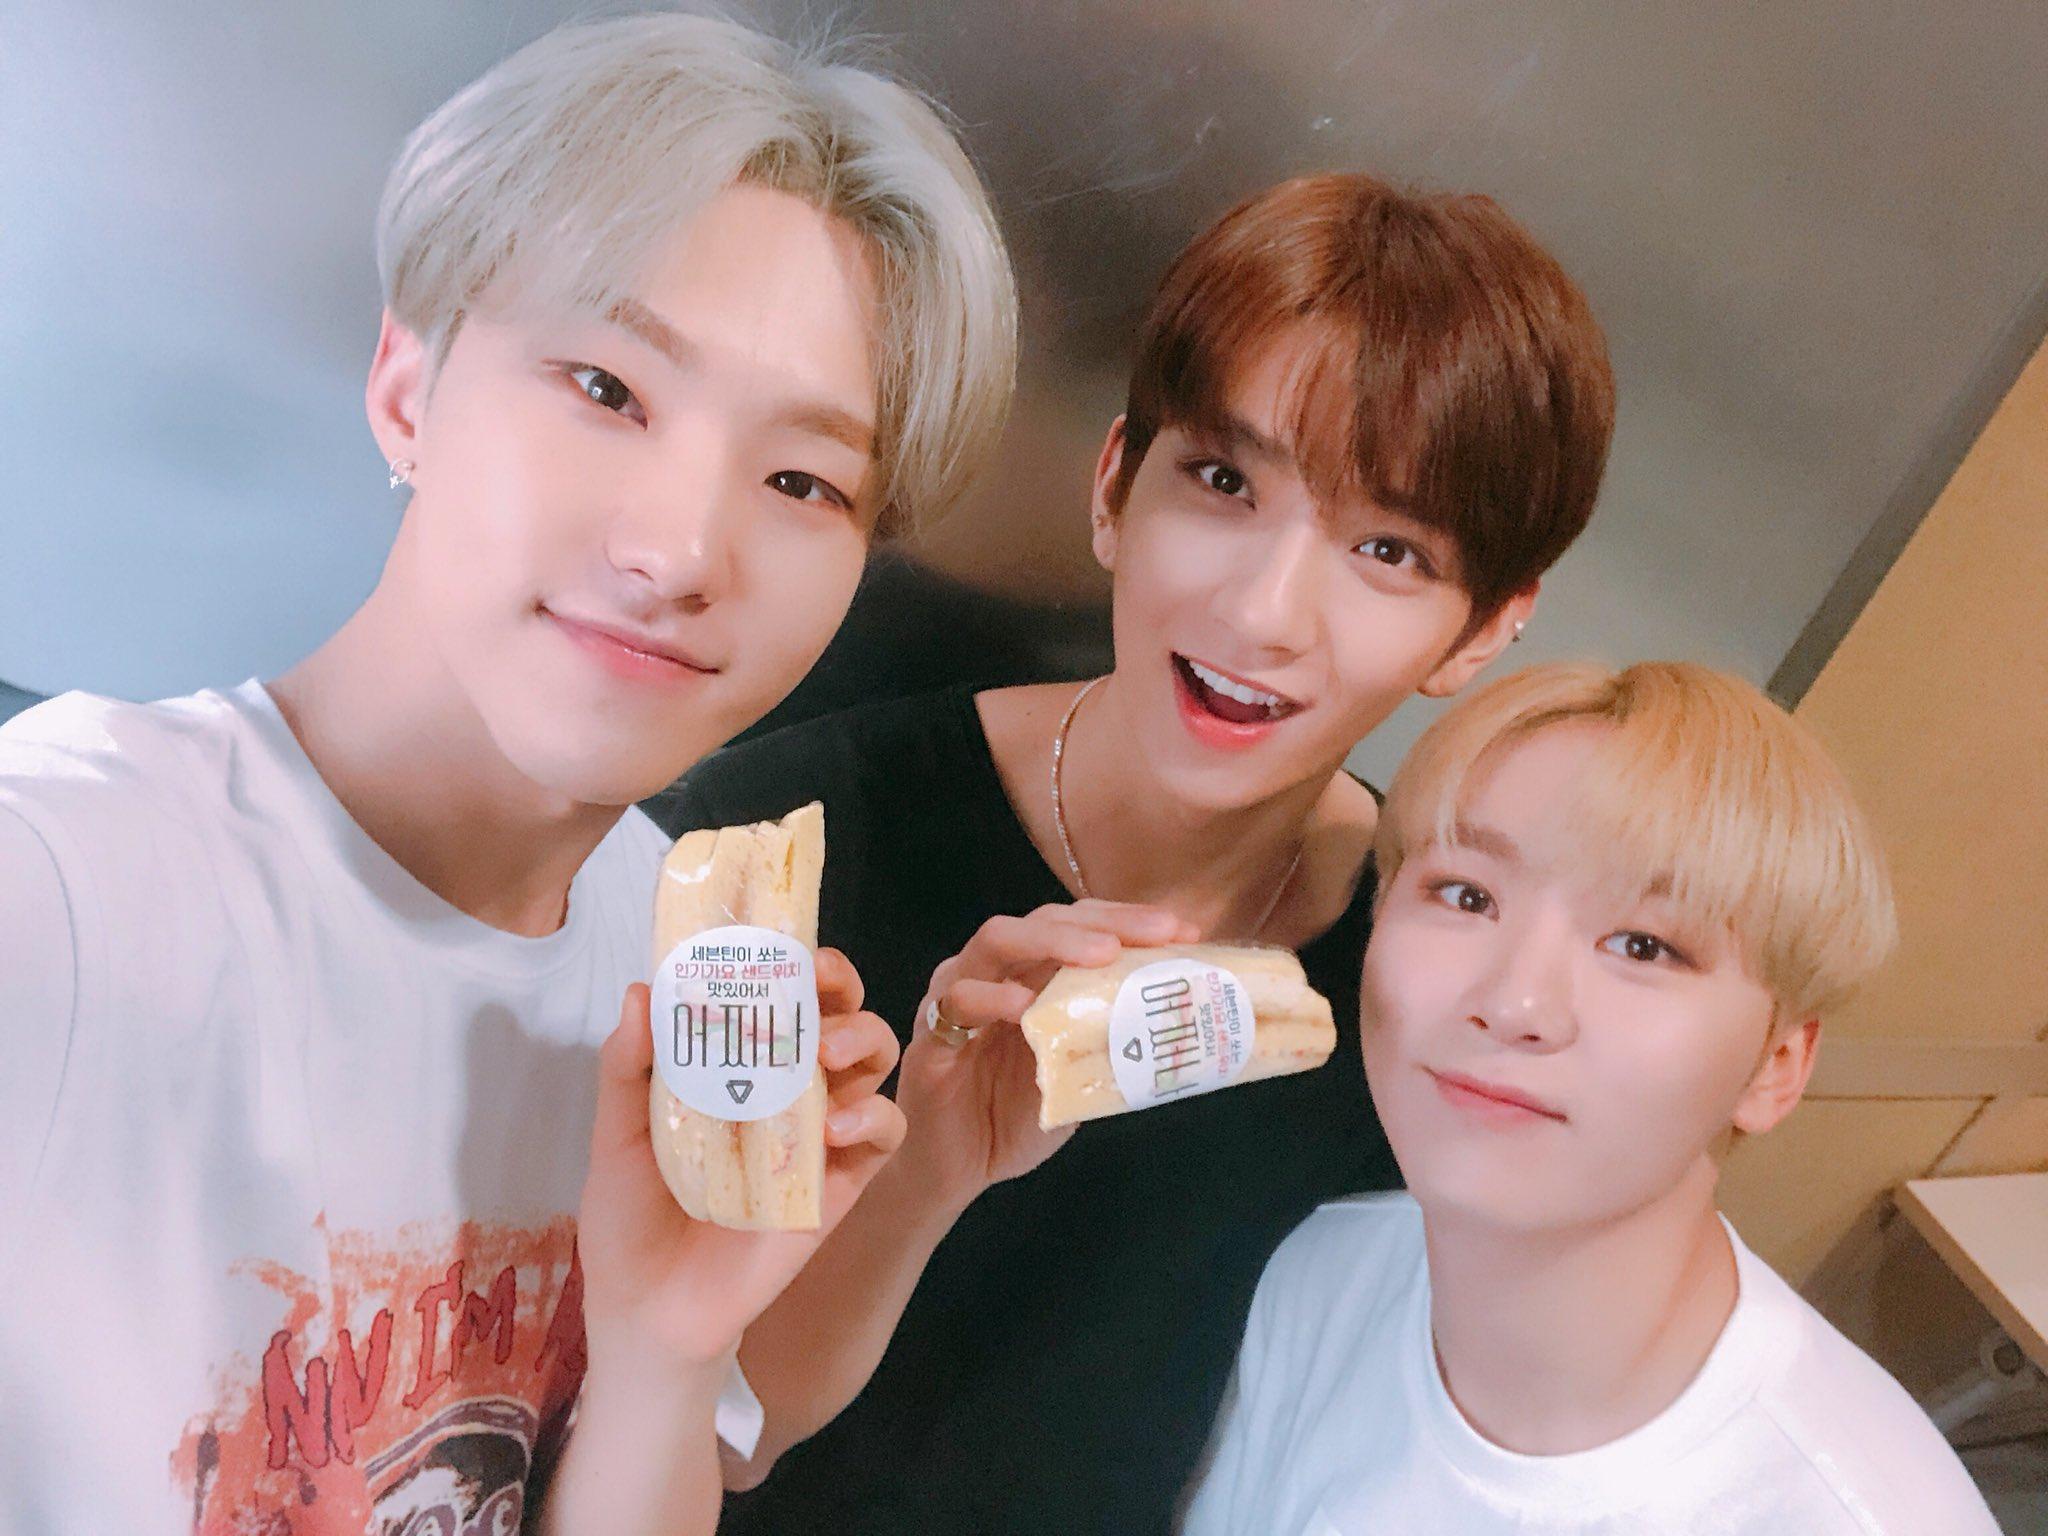 seventeen inkigayo sandwich @pledis_17 hoshi joshua seungkwan 2